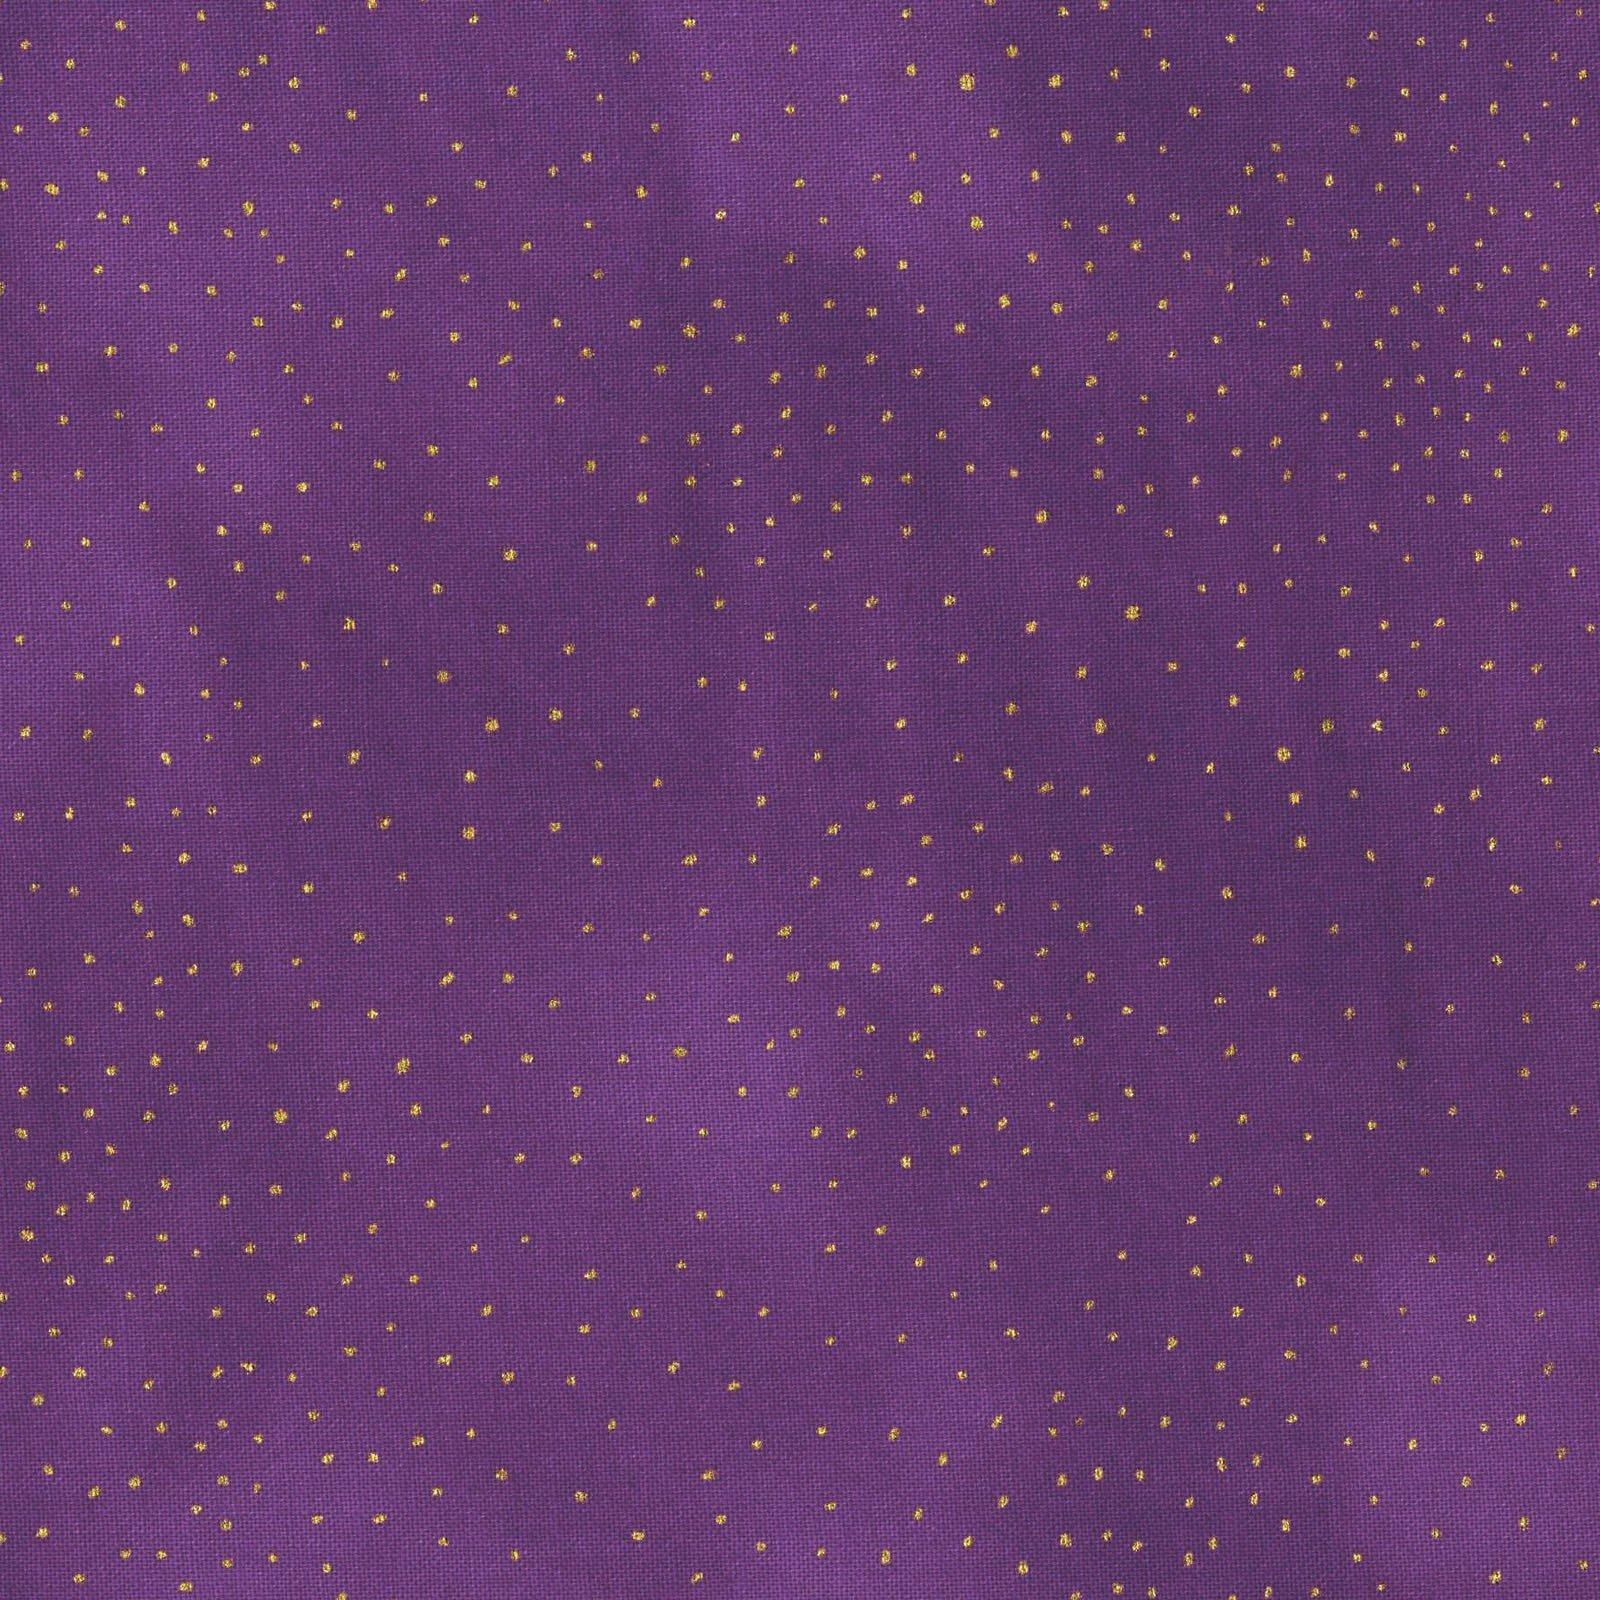 Basic Dot Purple/Gold<br/>Laurel Burch/Clothworks 90330-8M